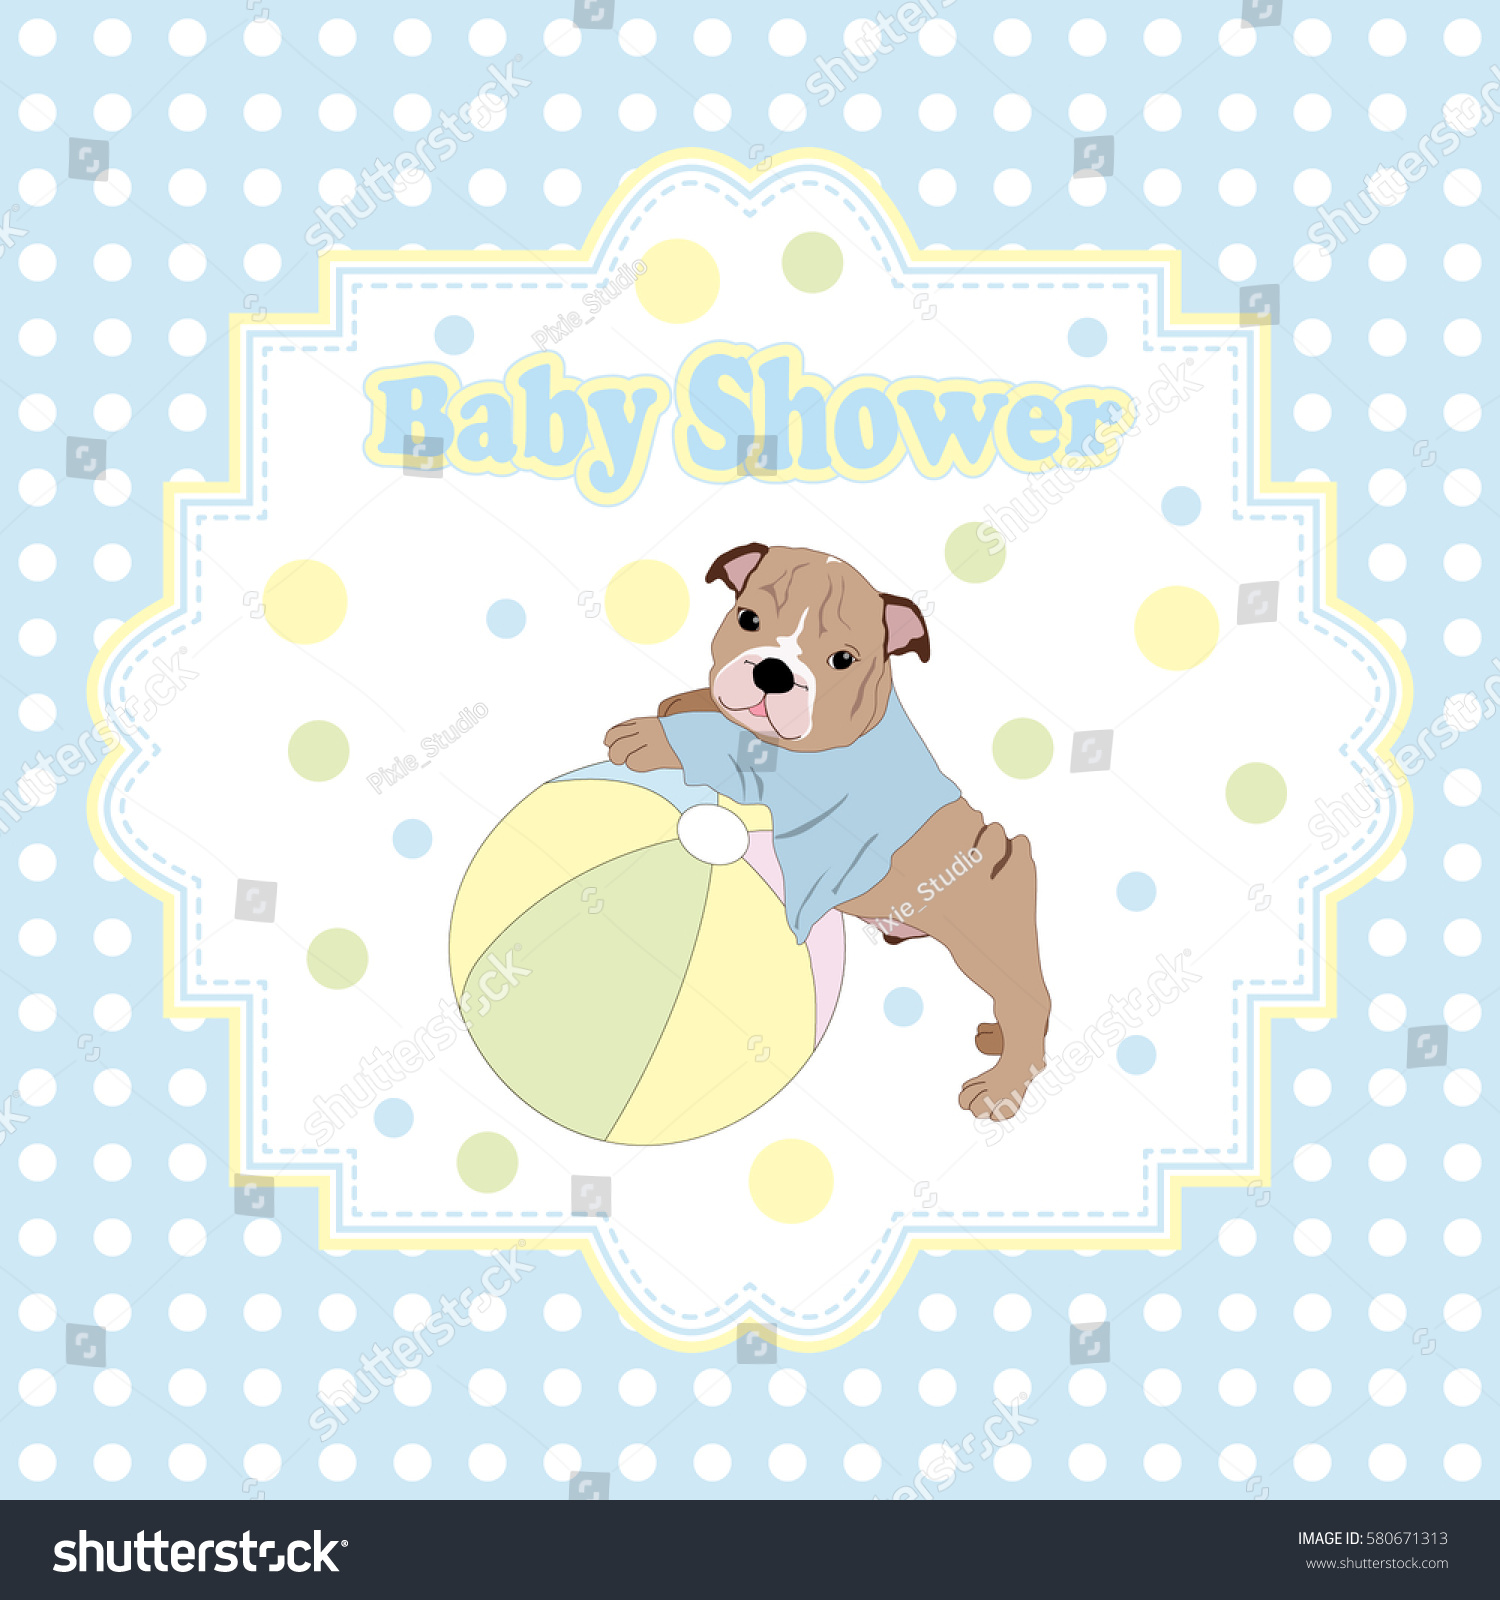 Baby Shower Invitation Card Puppy Ball Stock Photo (Photo, Vector ...